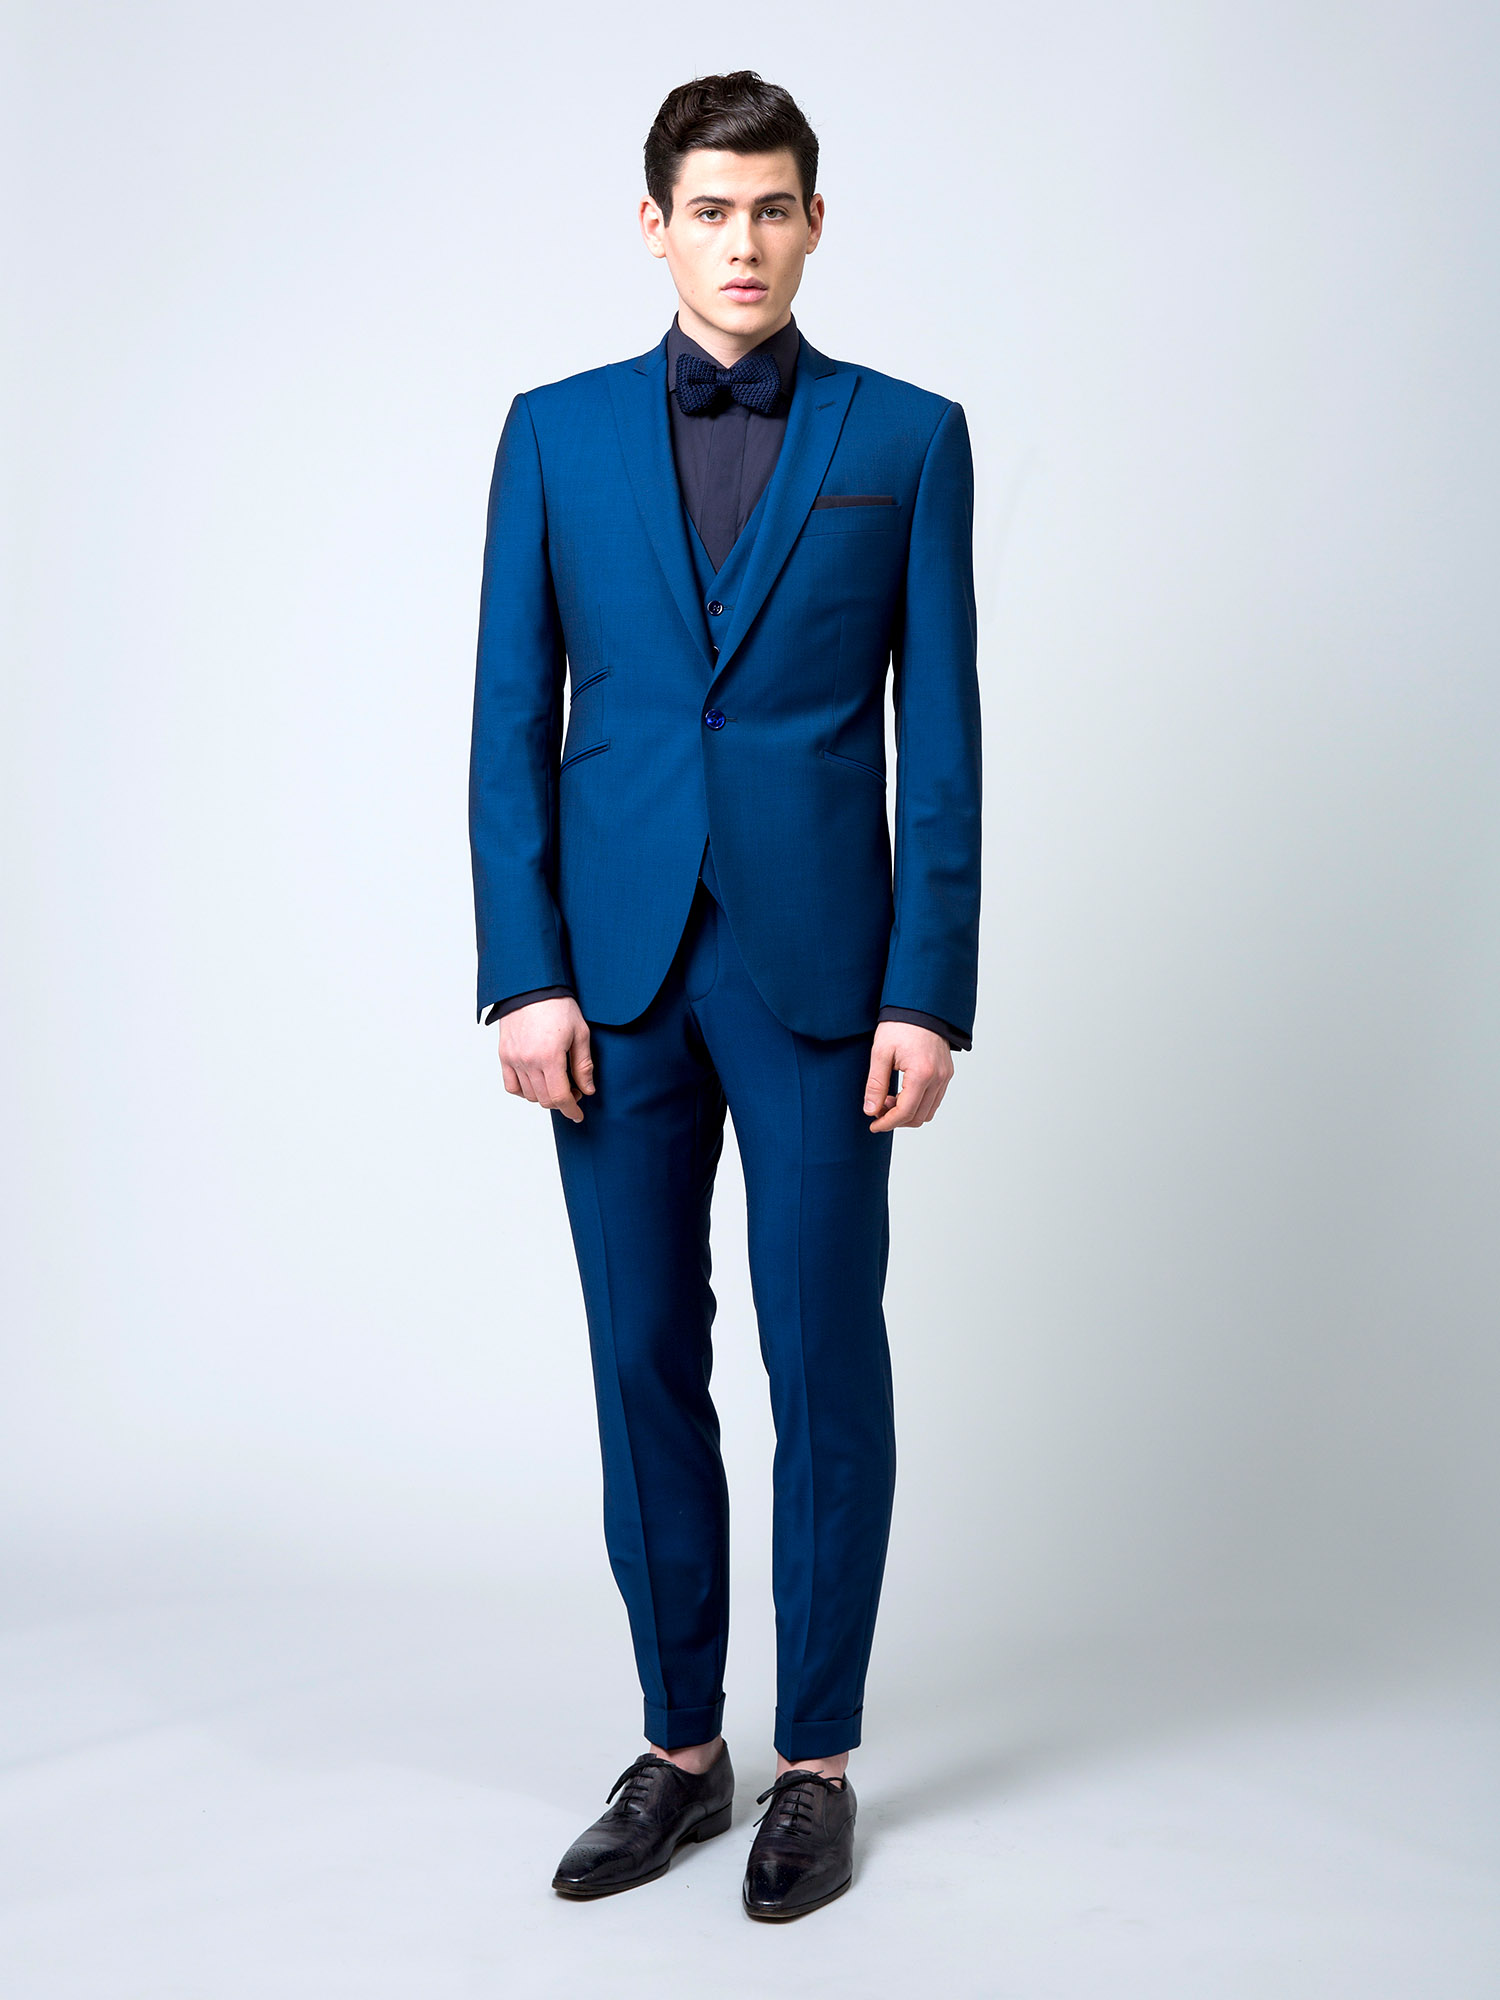 11 costume bleu canard home 1500 luxsure